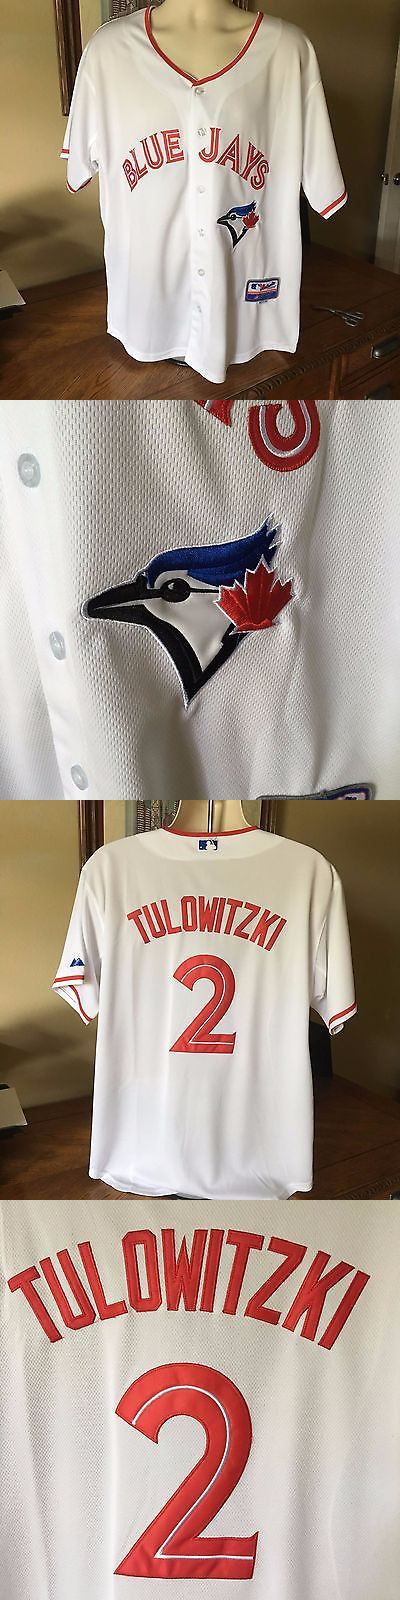 Other Baseball and Softball 181355: Toronto Blue Jays #2 Troy Tulowitzki White Flexbase Stitched Baseball Jersey Lrg BUY IT NOW ONLY: $49.95